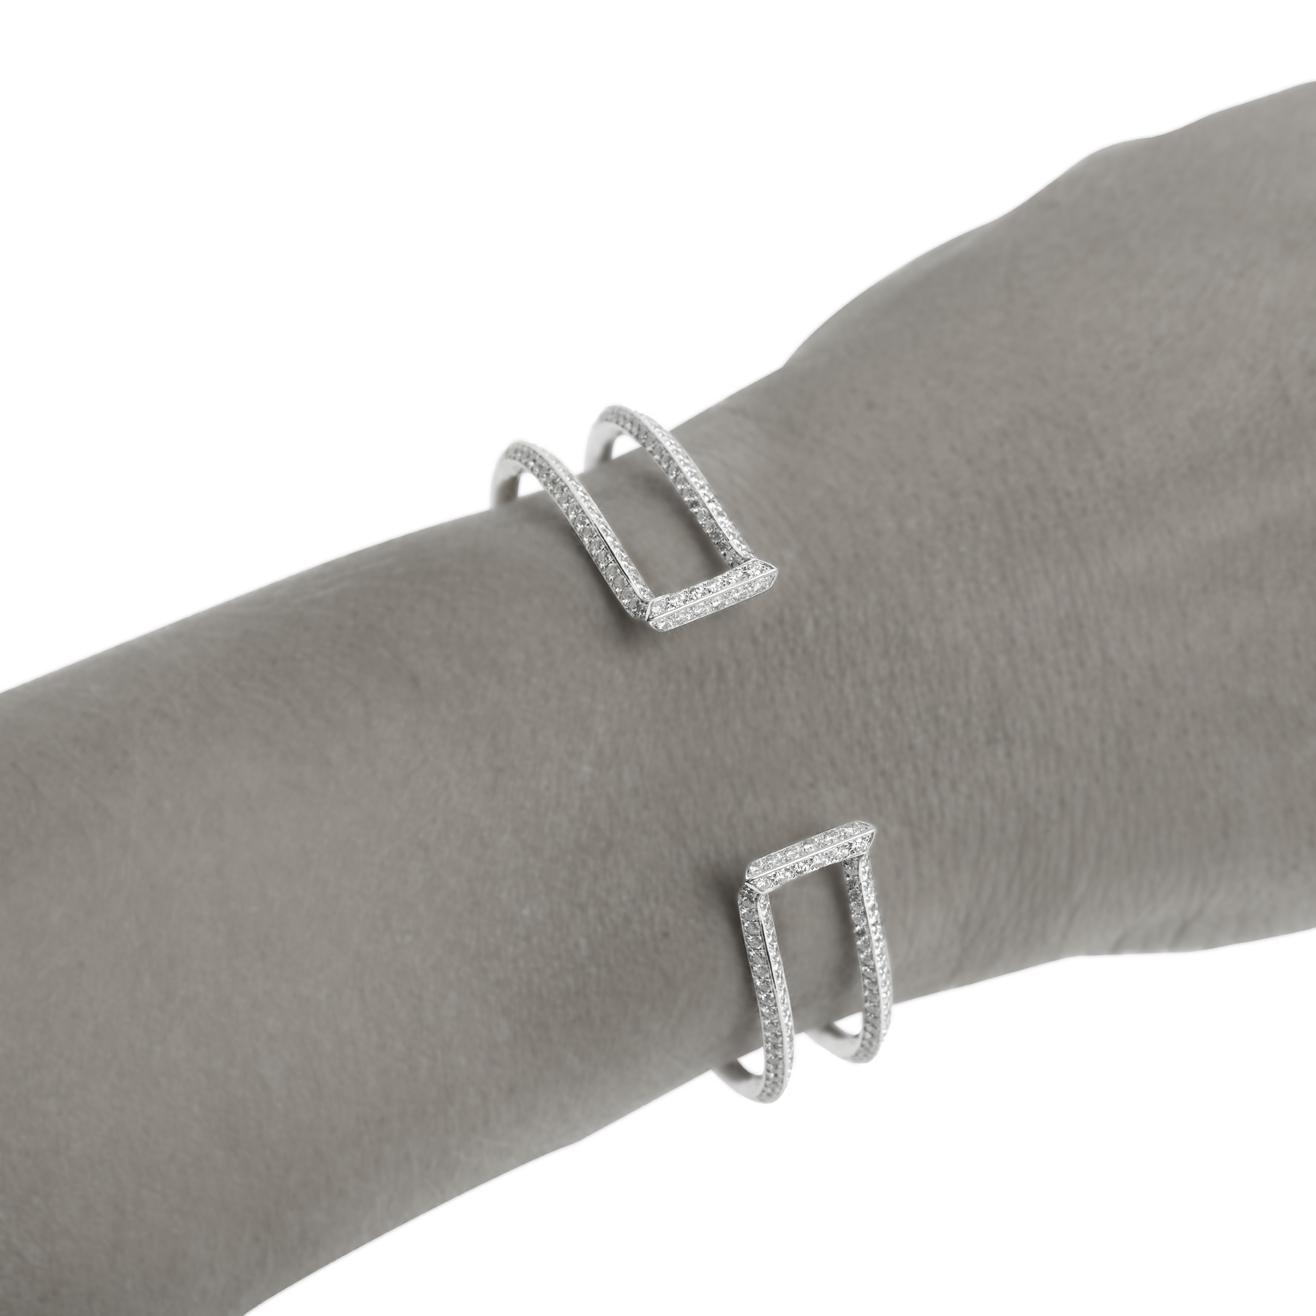 bracelet-poignee-verso-V2V-paris-nb